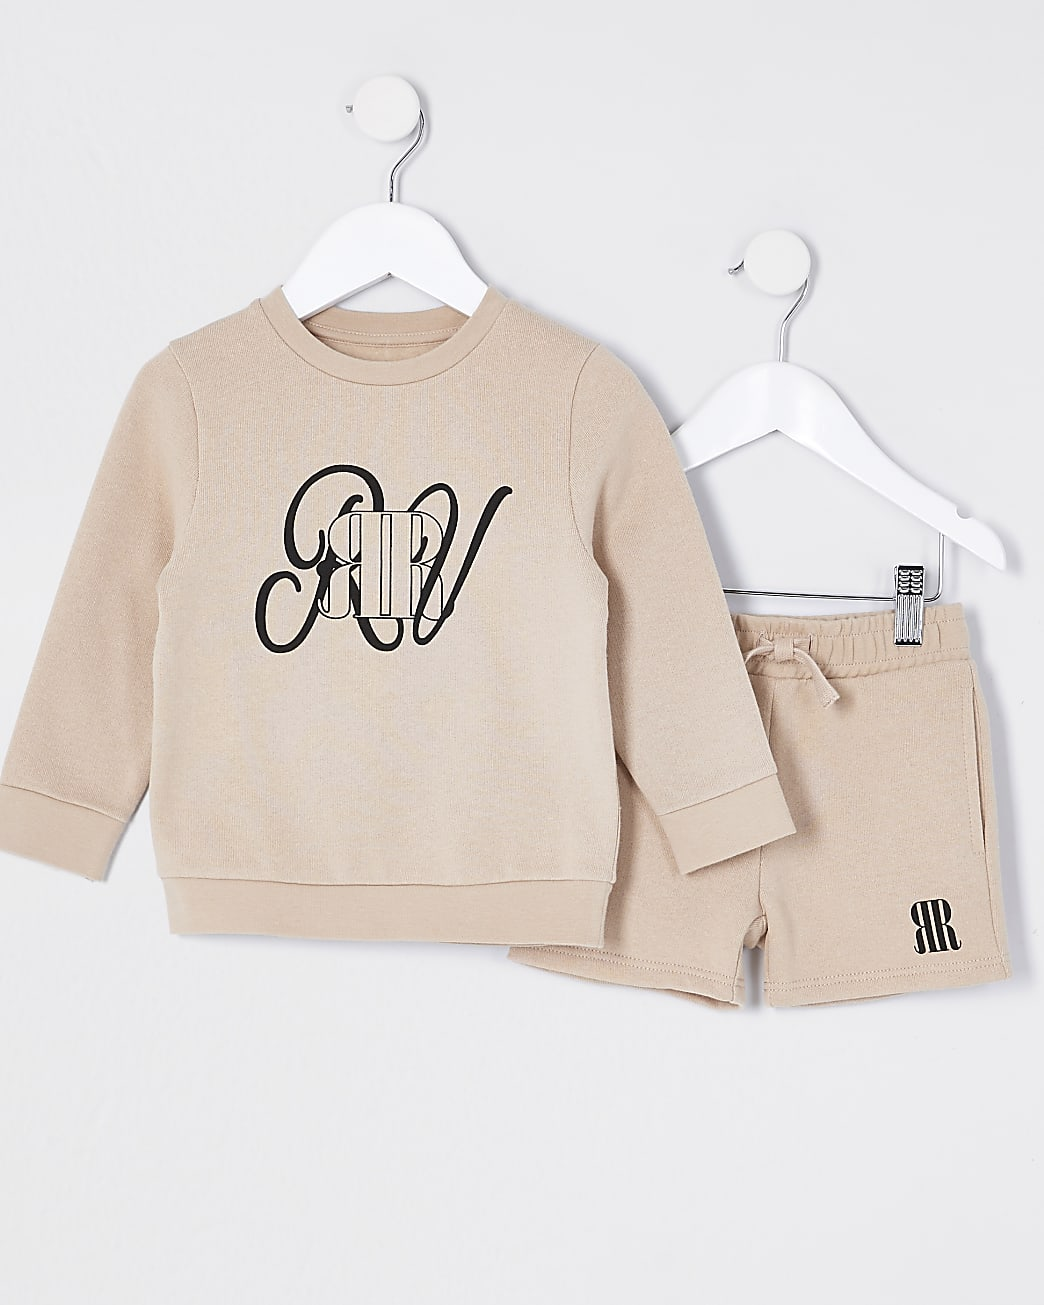 Mini boys stone sweatshirt outfit